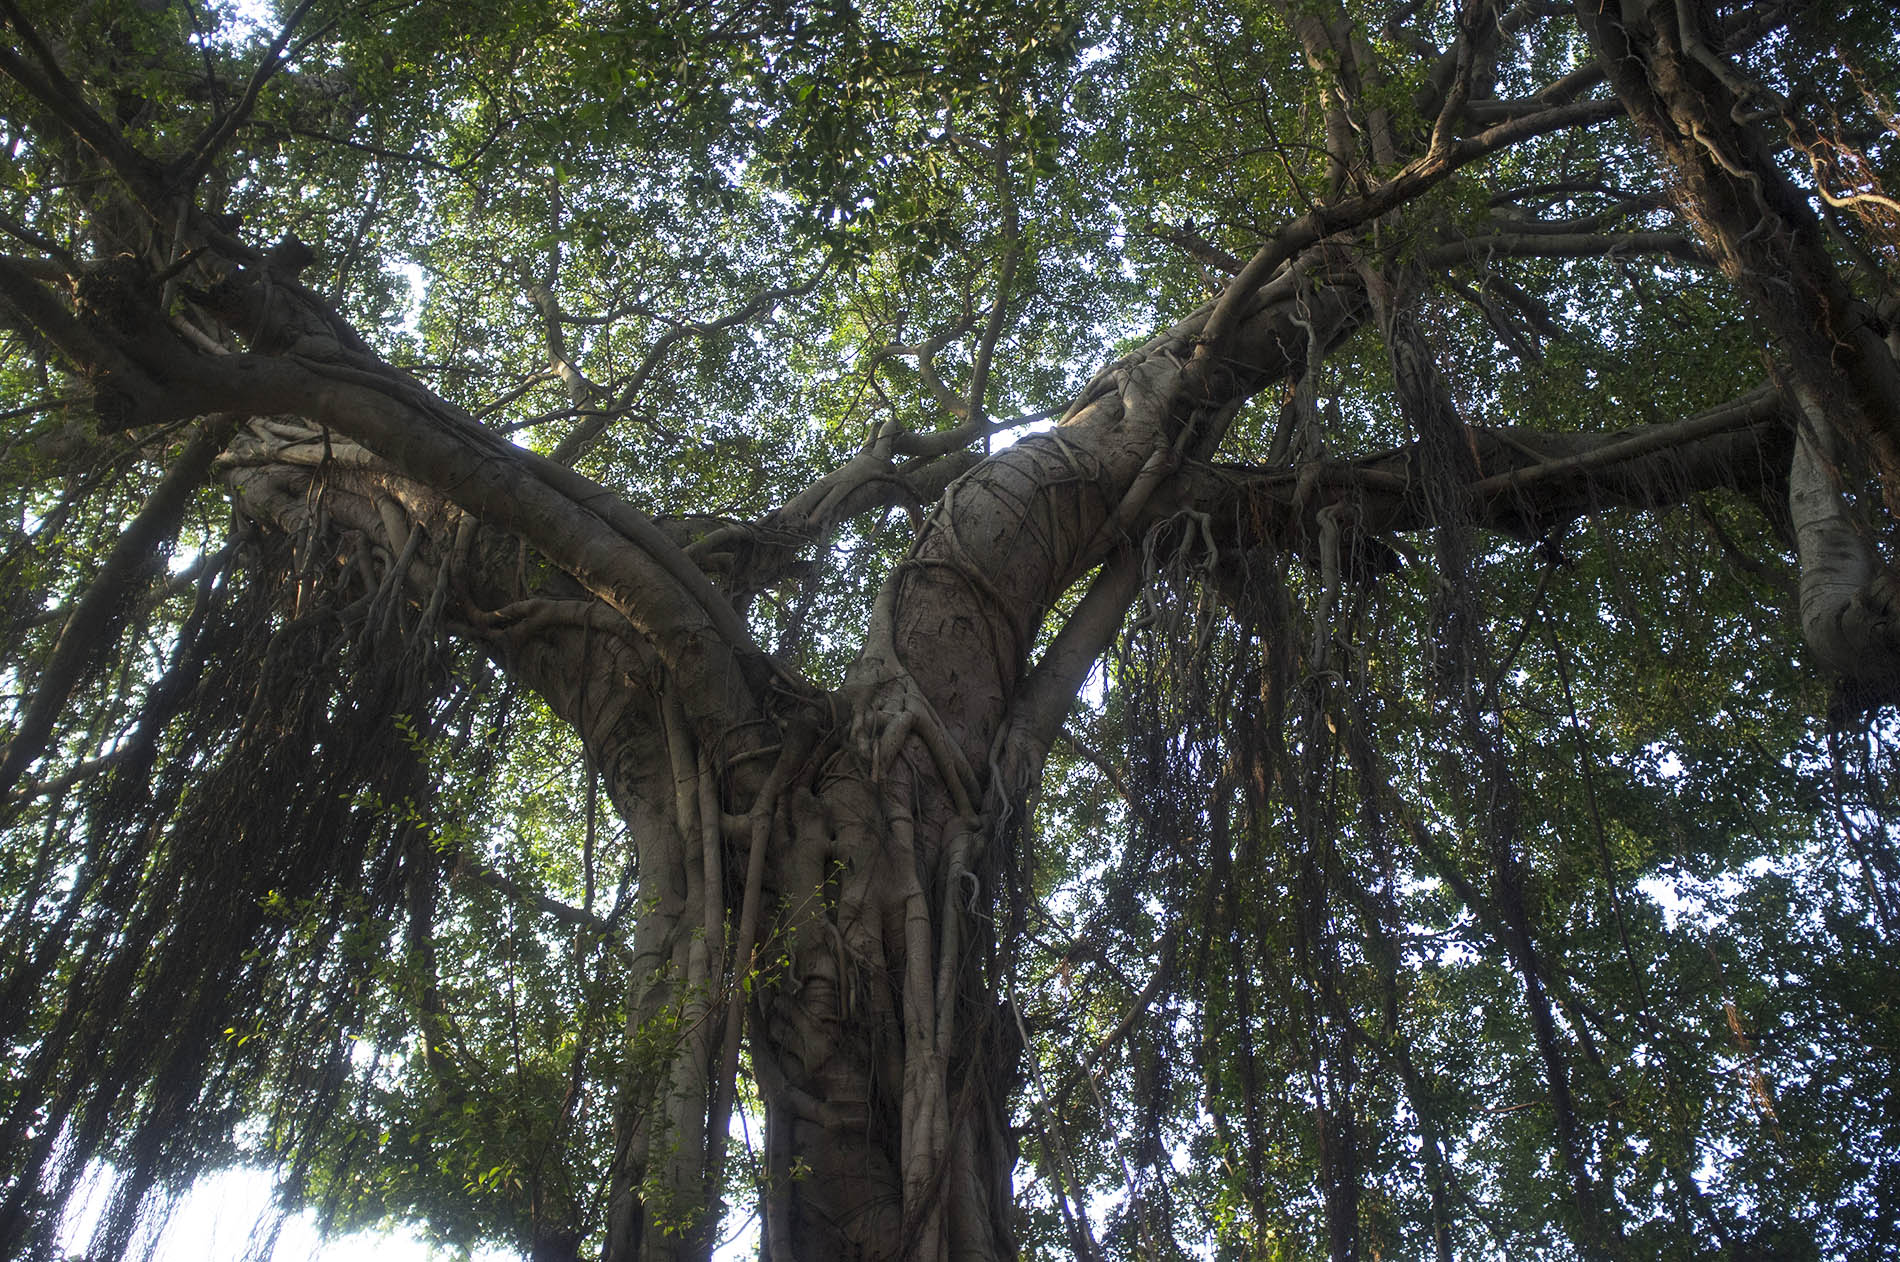 The local trees are elegant.